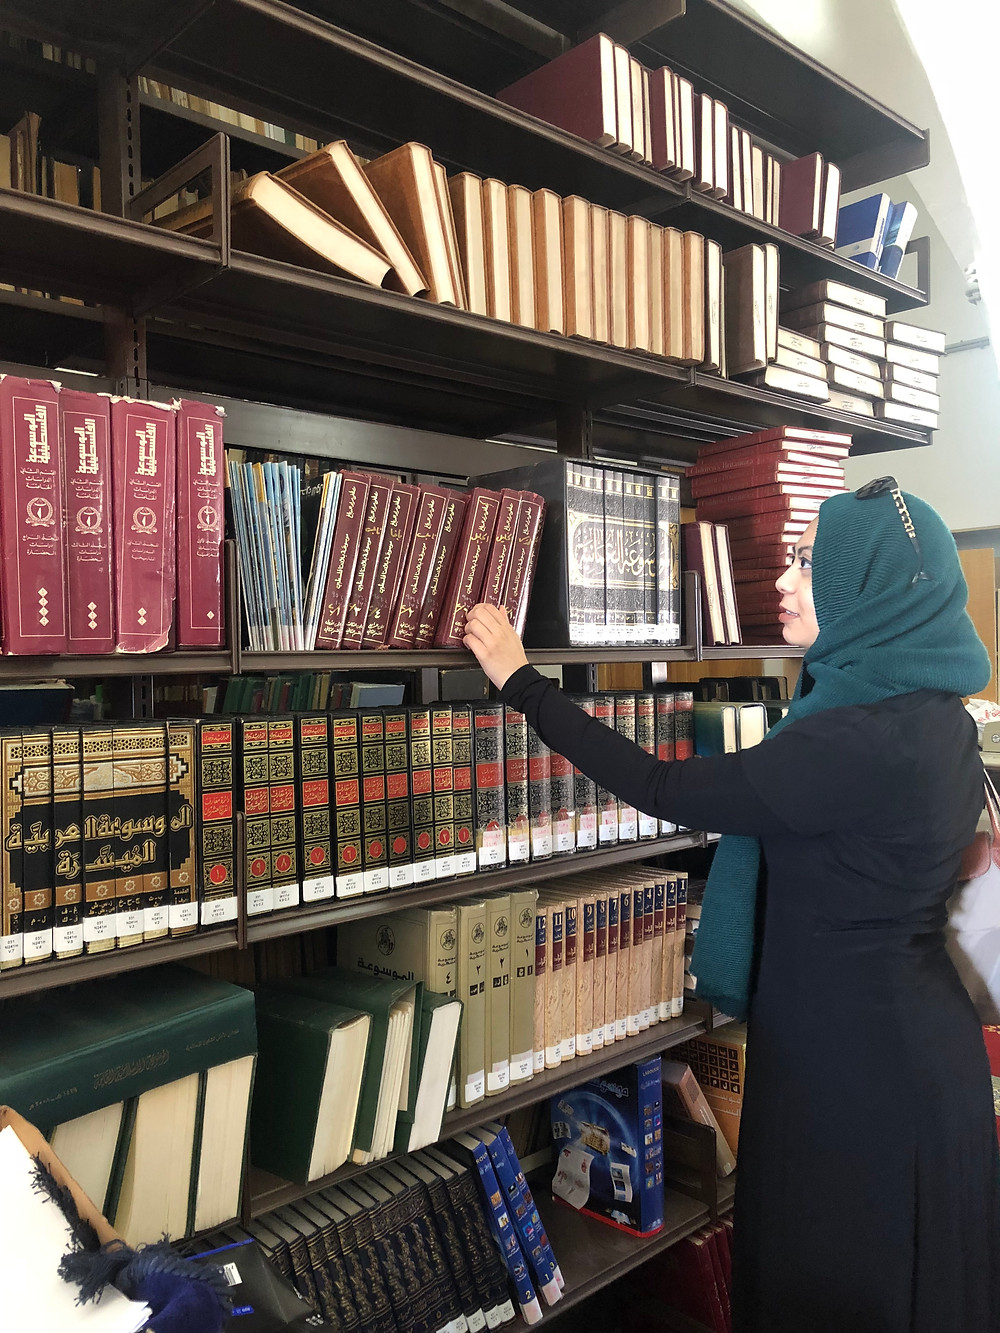 Aqsa Library Masjid Al Aqsa Palestine